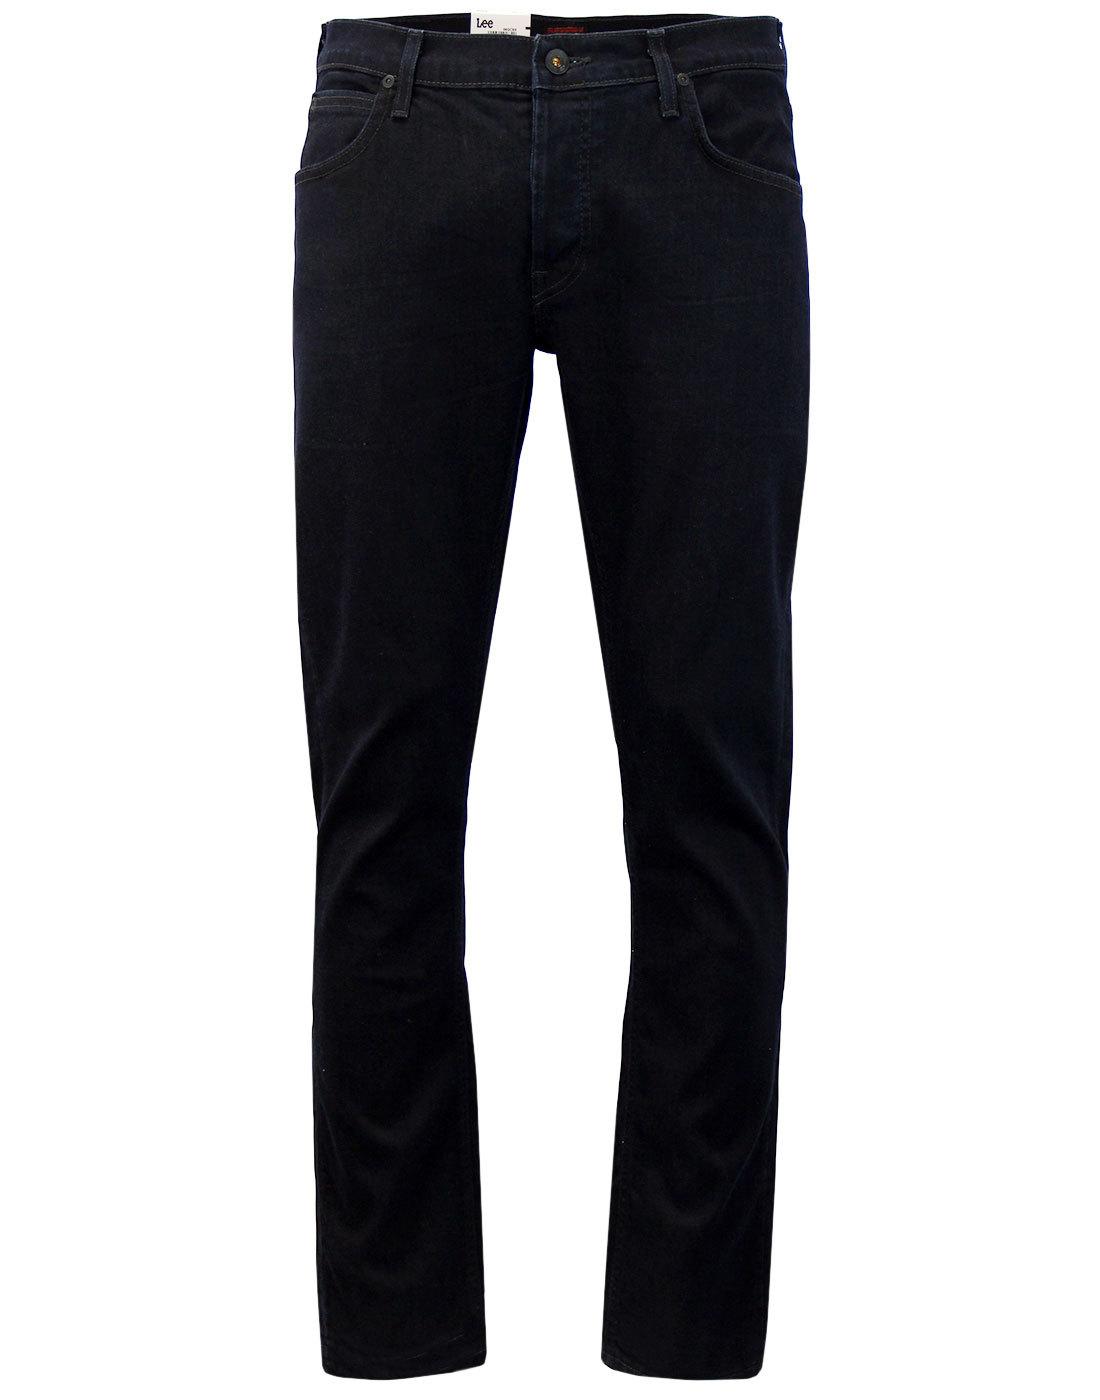 Daren LEE Mod Regular Slim Indigo Denim Jeans (DP)